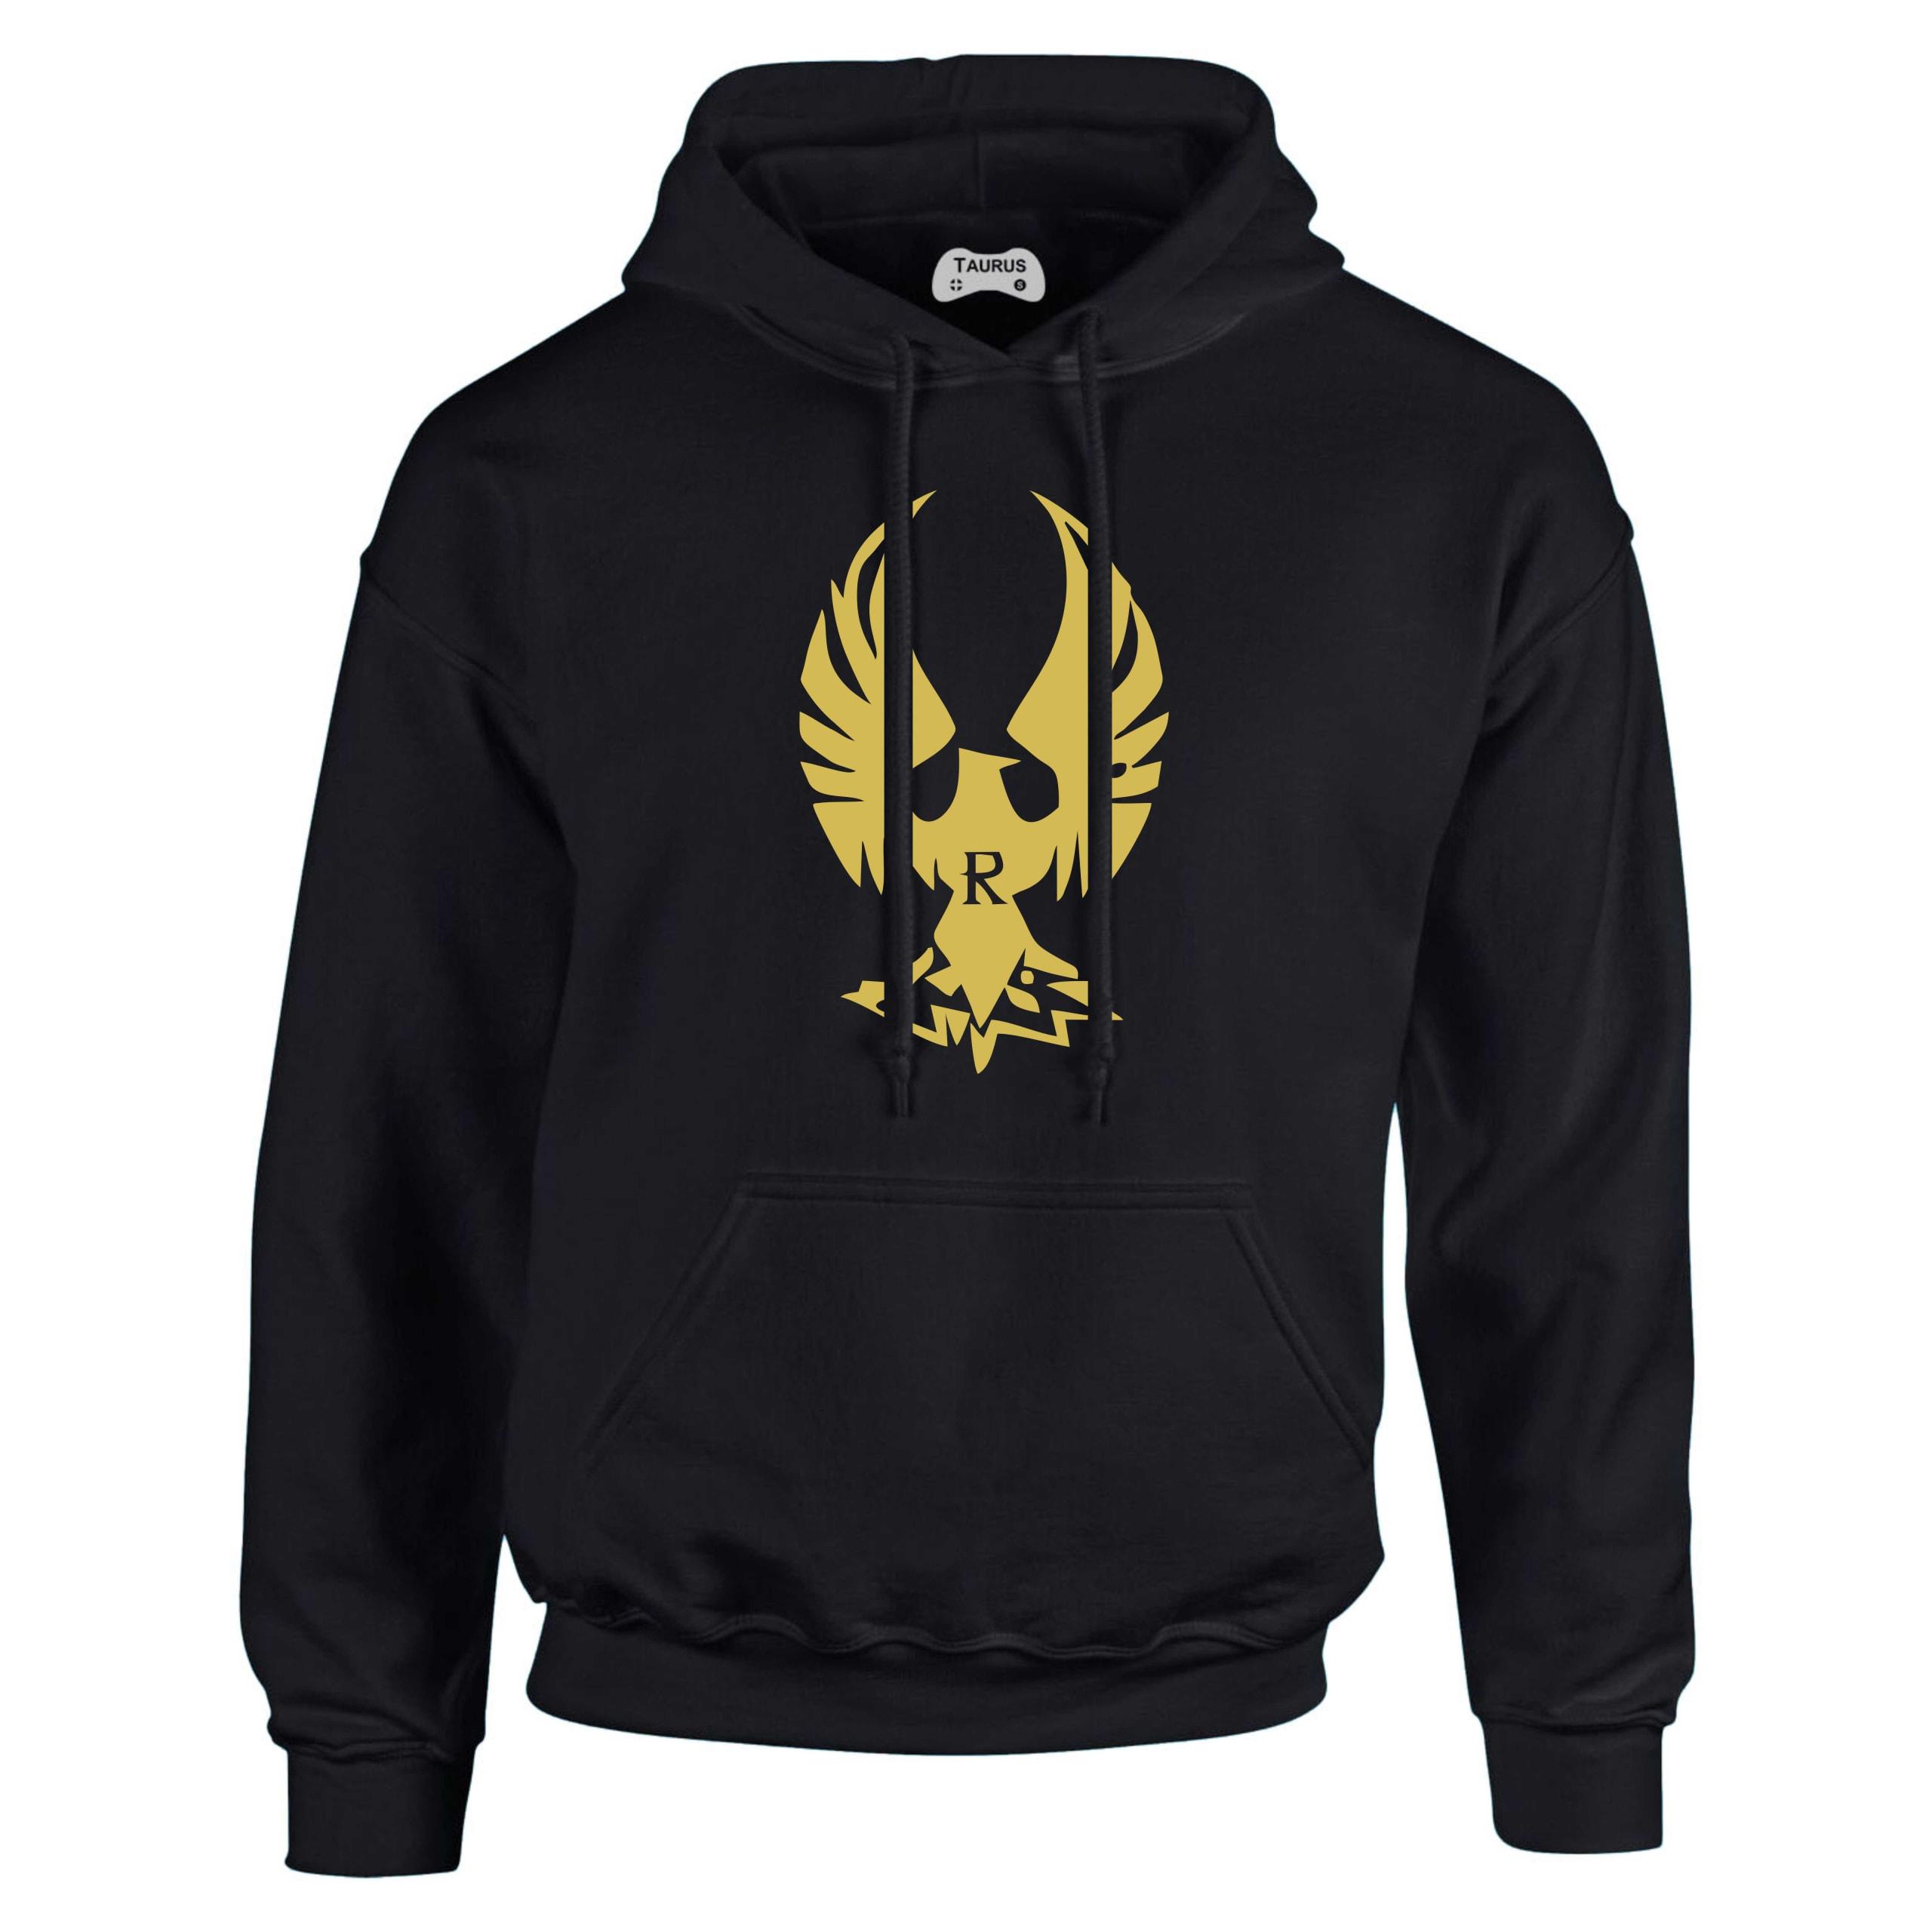 Dishonored 2 Hoodie Eagle